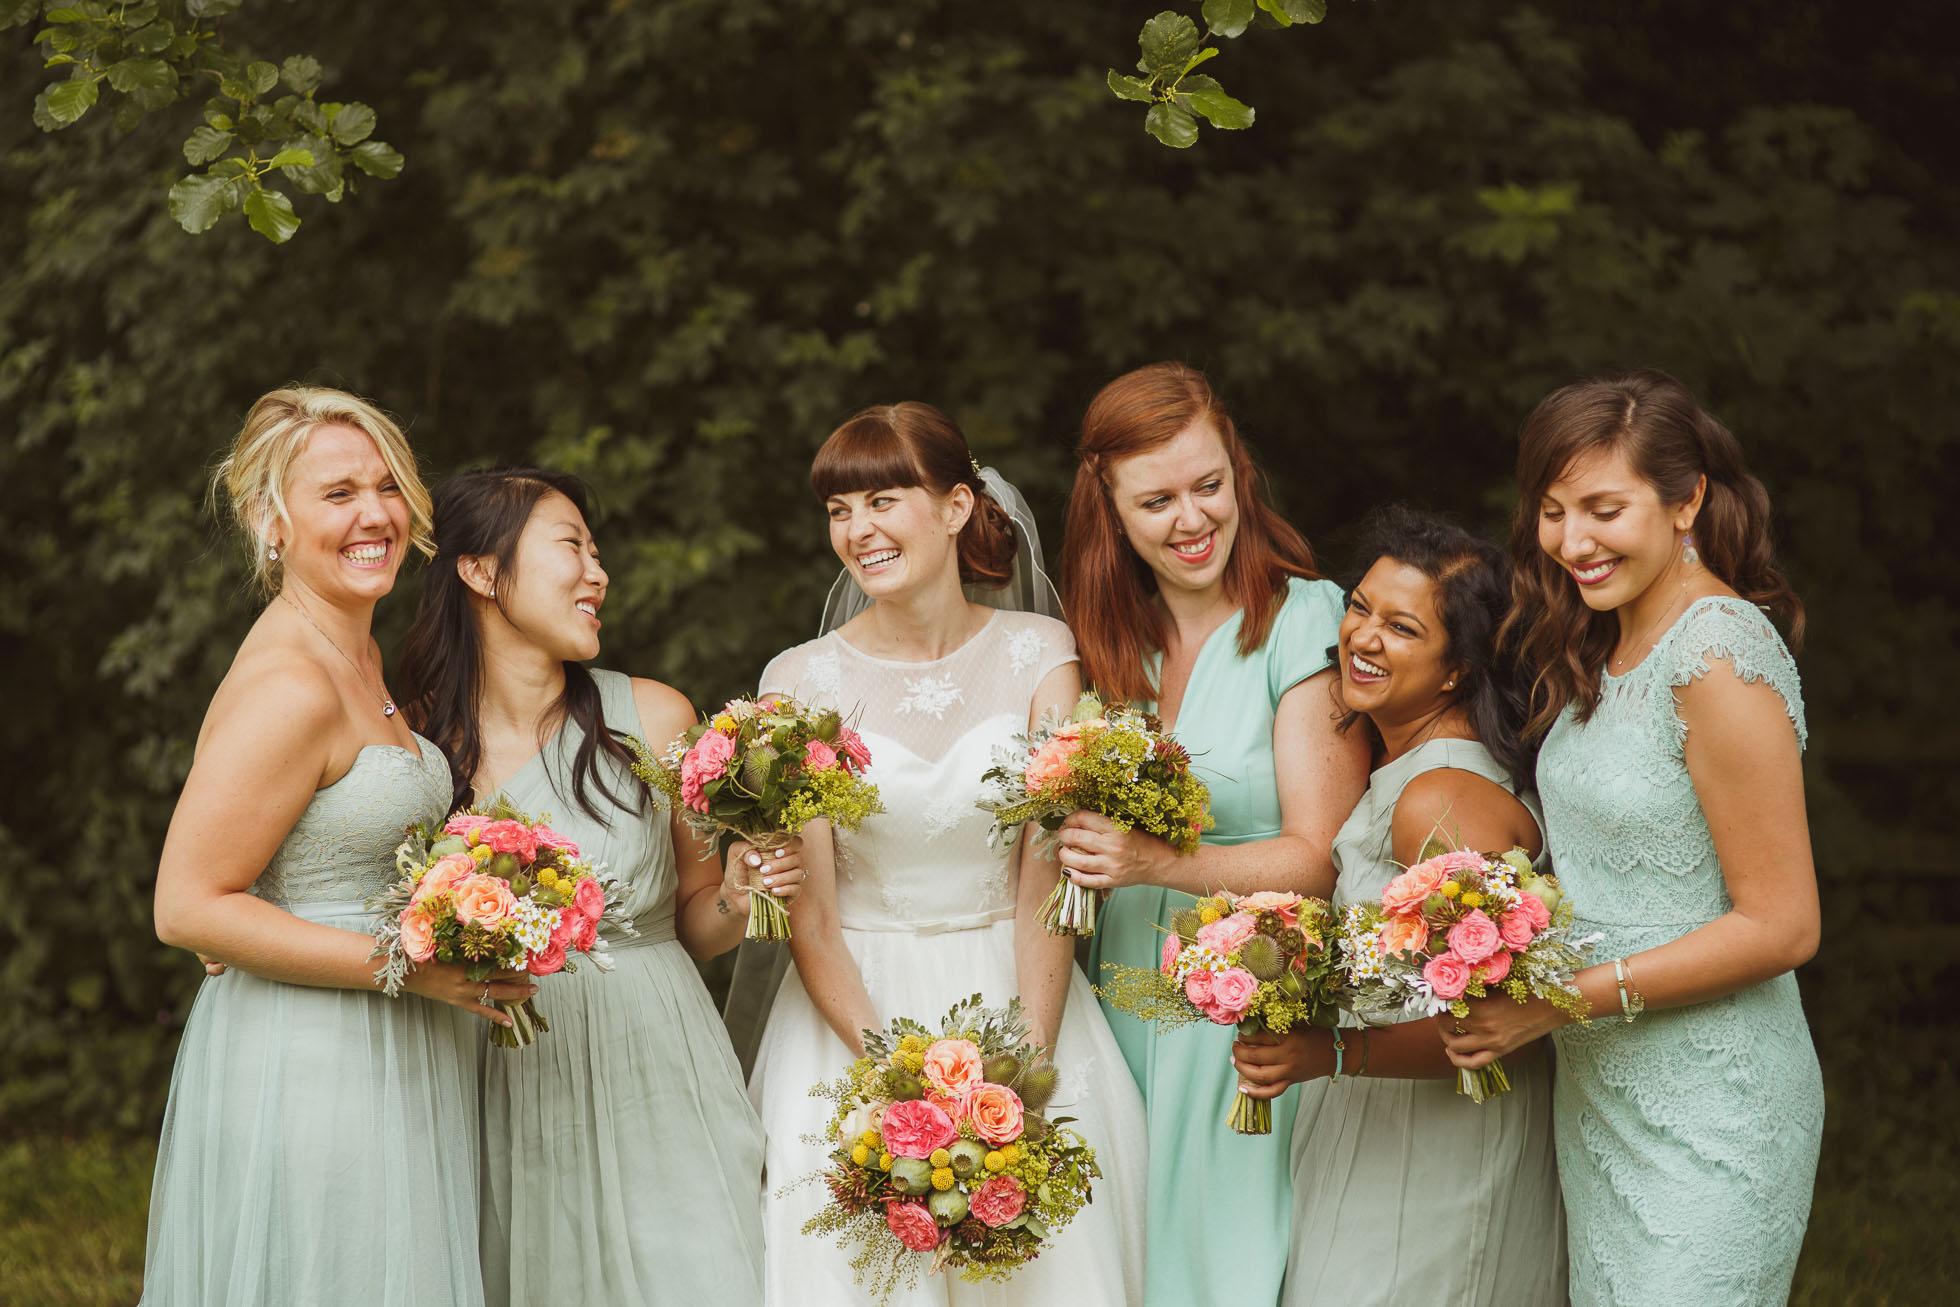 hackness wedding photographer-70.jpg